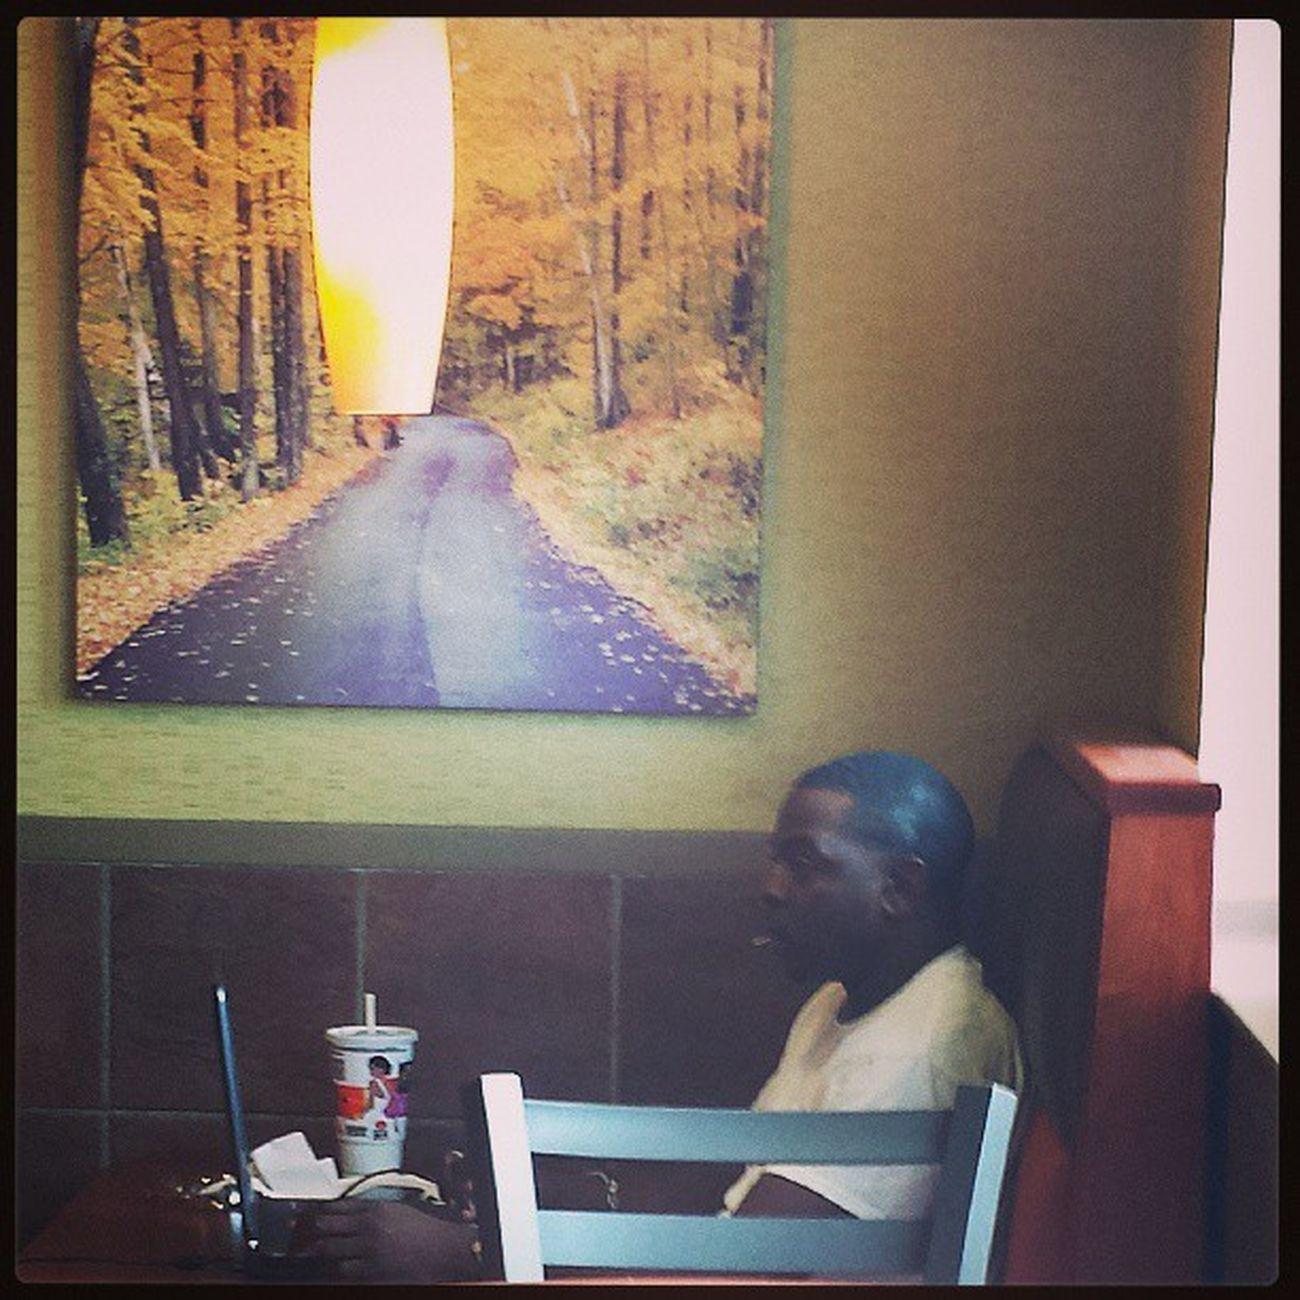 Drug dealer at small town McDonald's LOL Laptop Phone Nofood soda